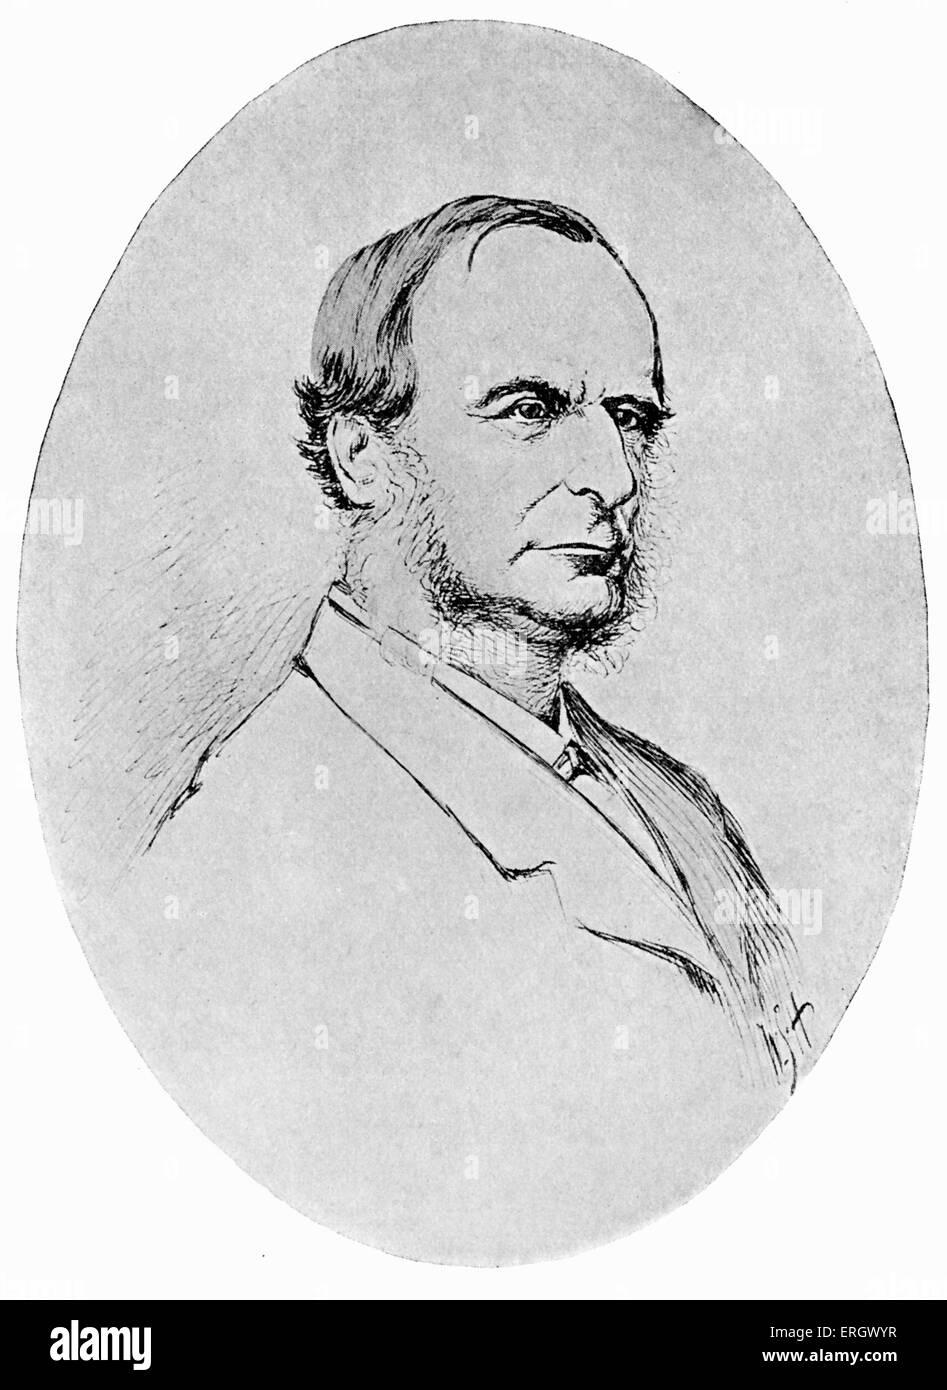 Charles Kingsley:  English novelist, 12 June 1819 – 23 January 1875. - Stock Image